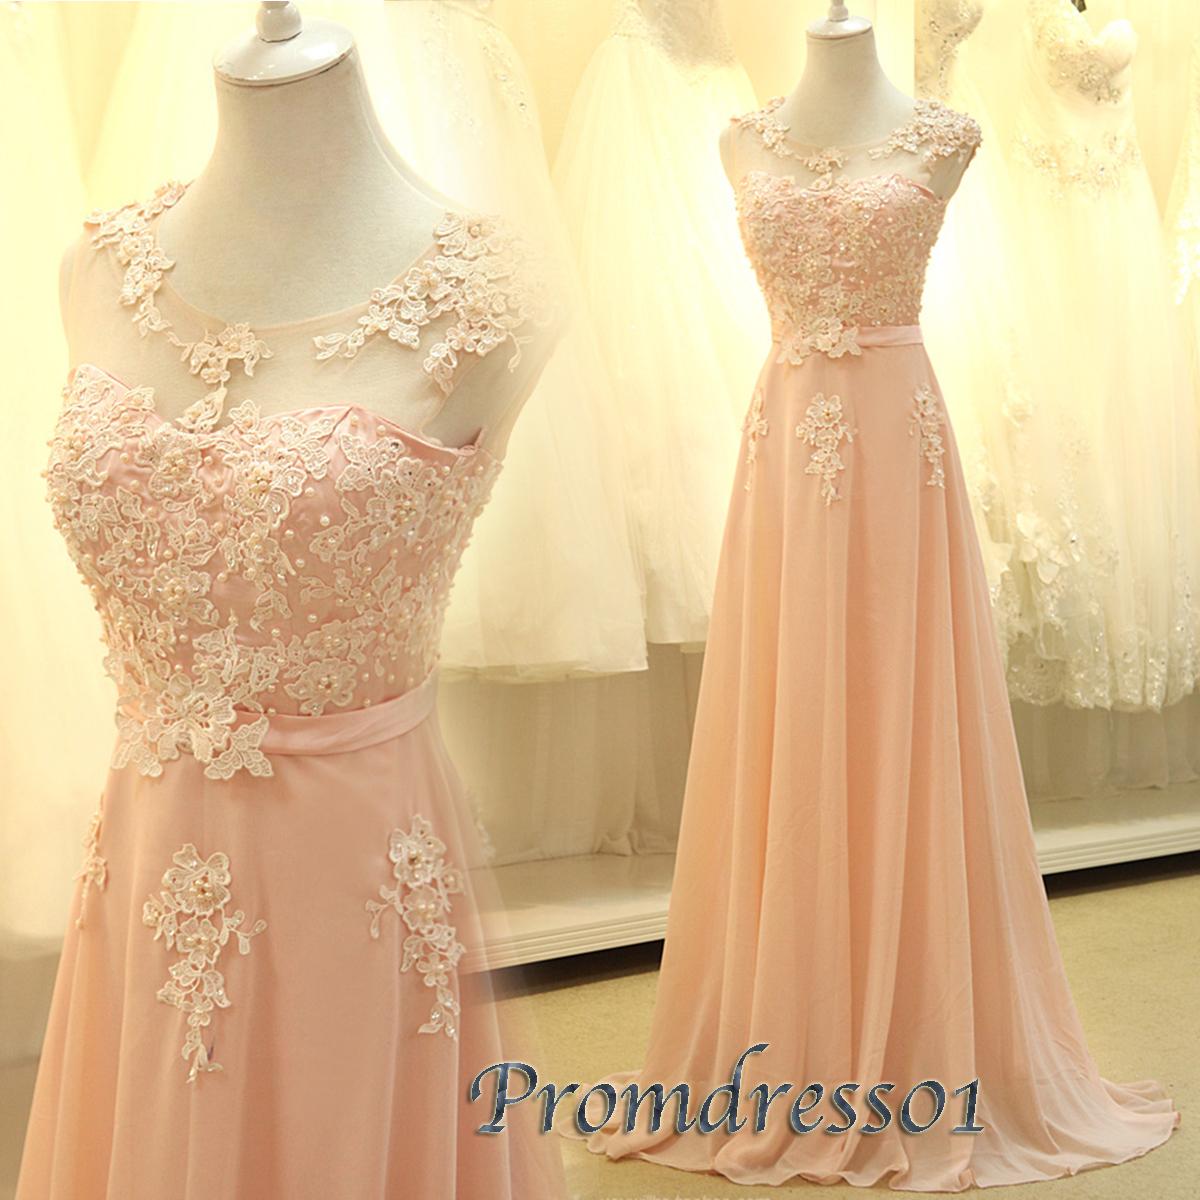 Elegant new design pink slim long lace prom dress | Prom ...